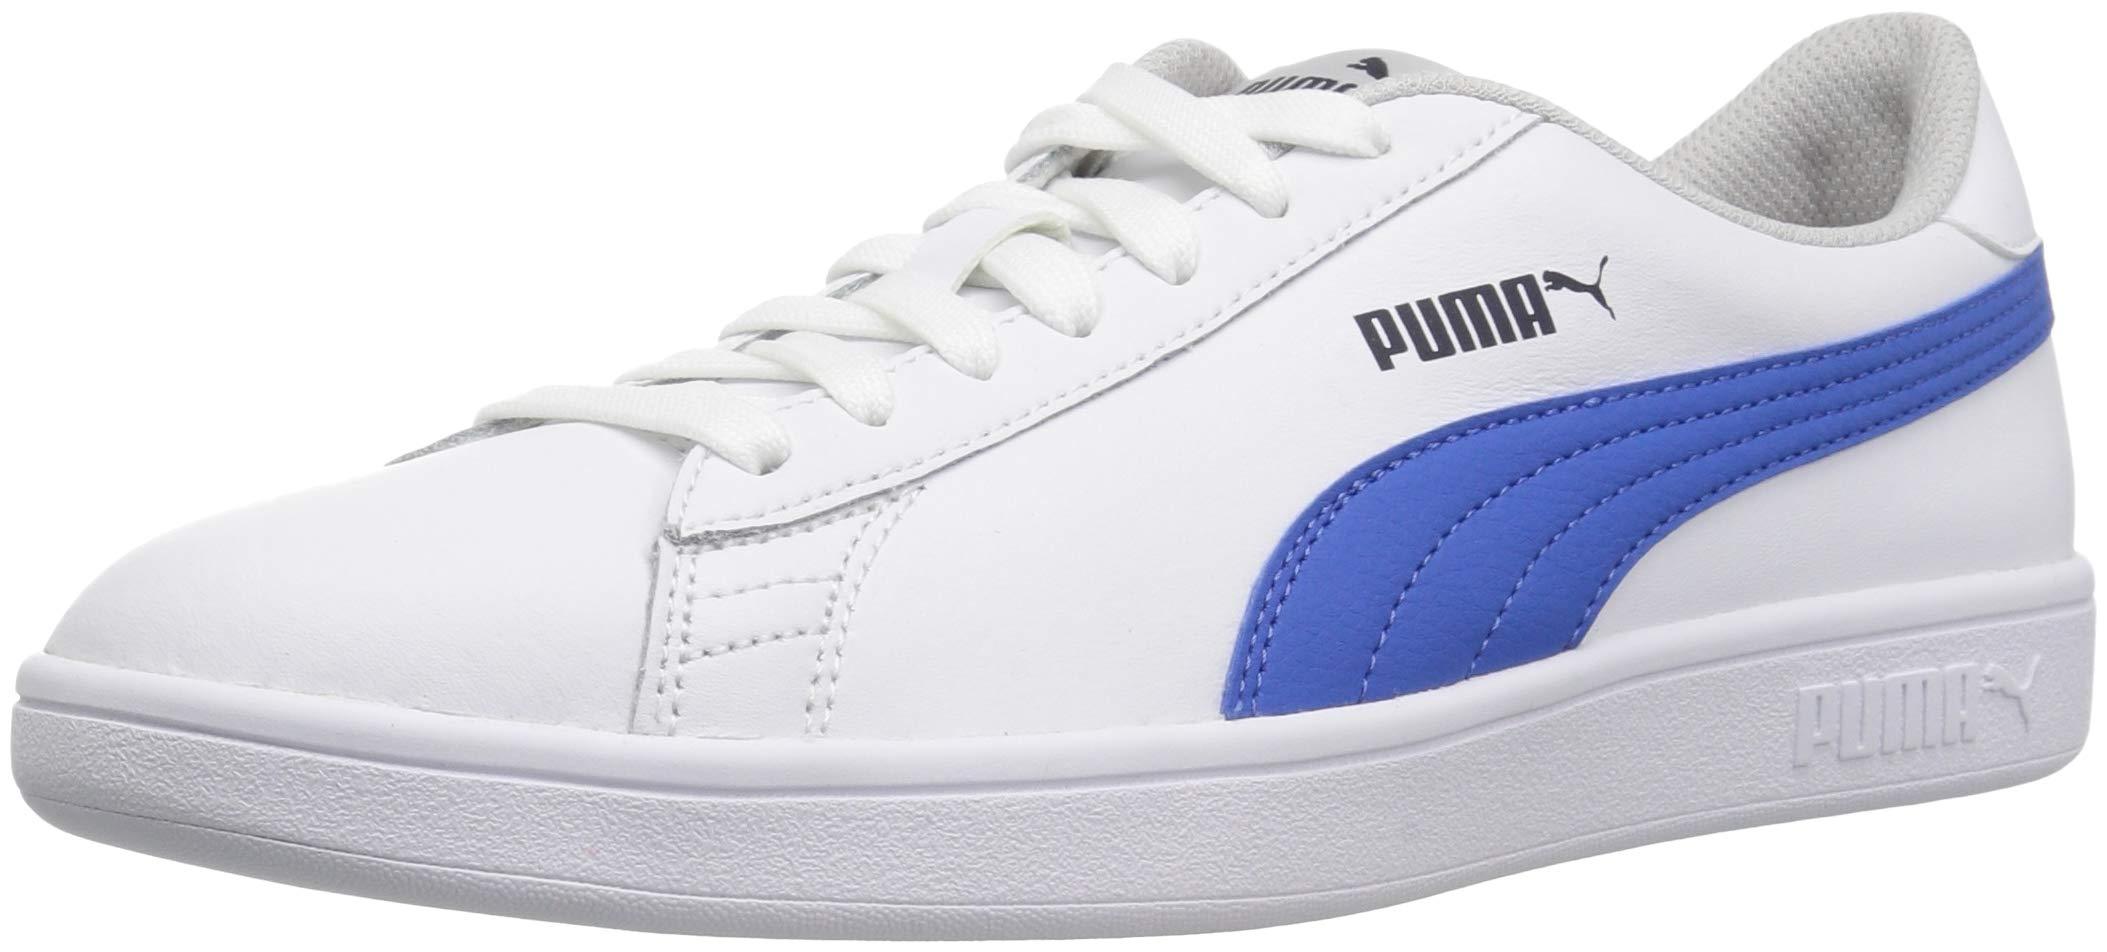 PUMA Unisex-Kids Smash Leather Jr Sneaker, White-Strong Blue-Peacoat-Gray Violet, 4.5 M US Big Kid